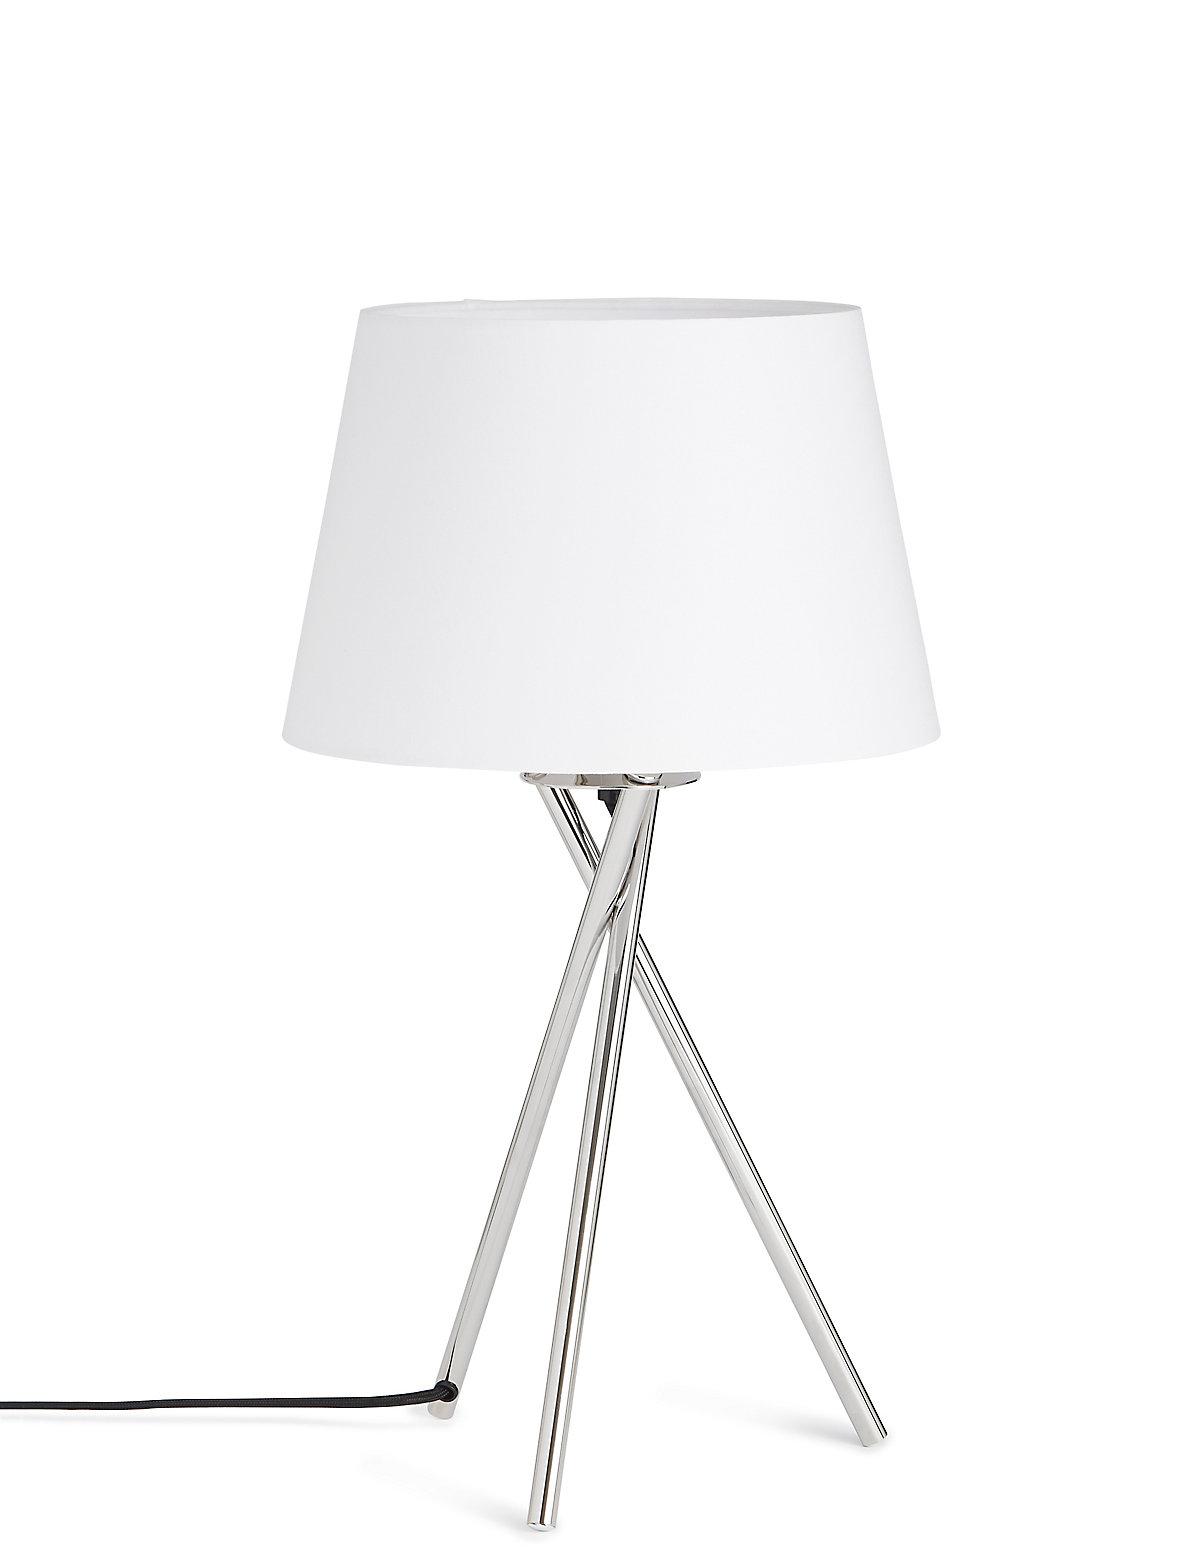 Image of Alexa Table Lamp